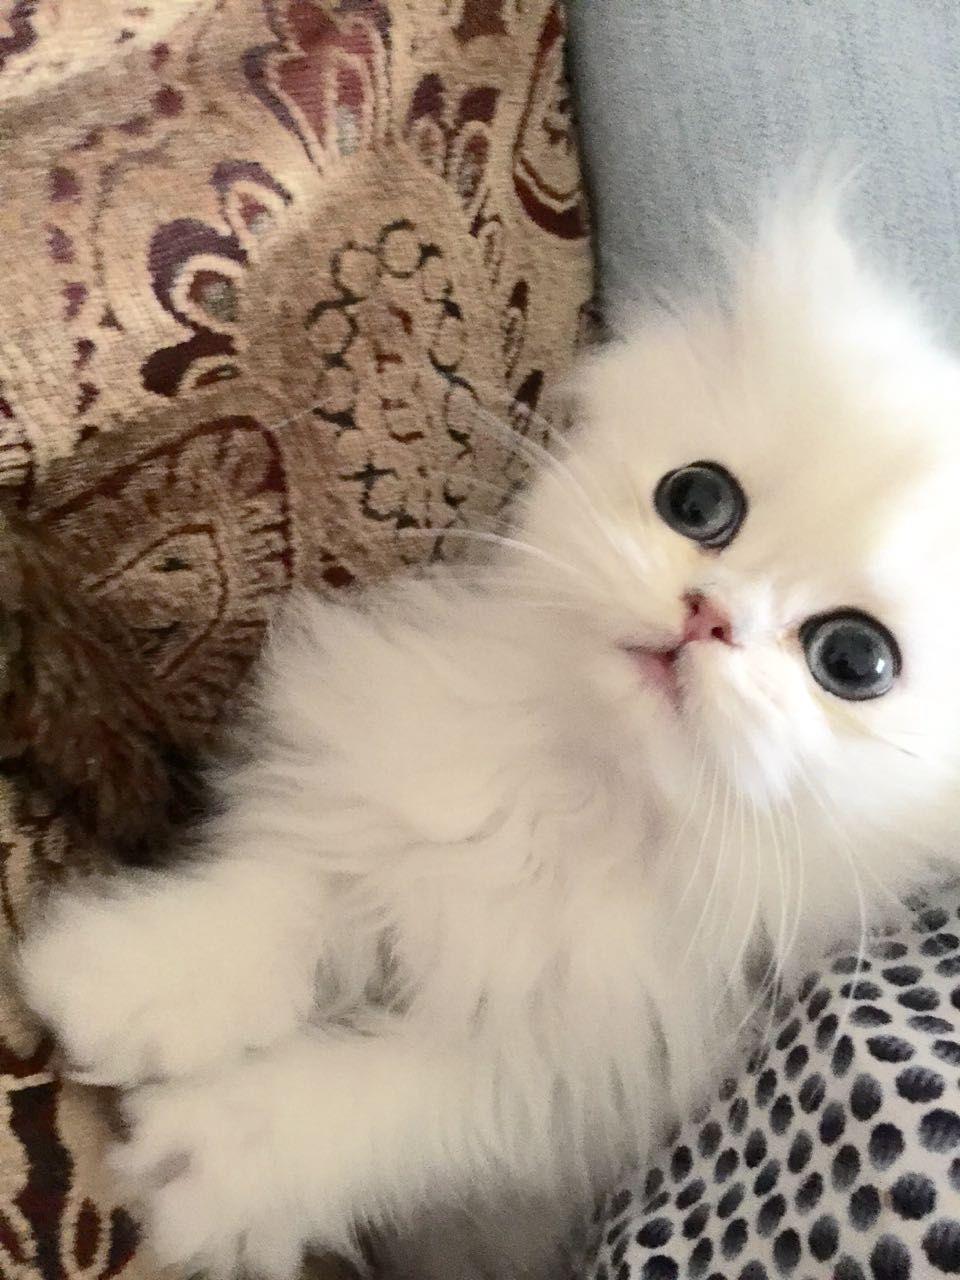 Persian Kittens Gallery Teacup Kittens For Sale Teacup Kitten Persian Kittens Cats And Kittens